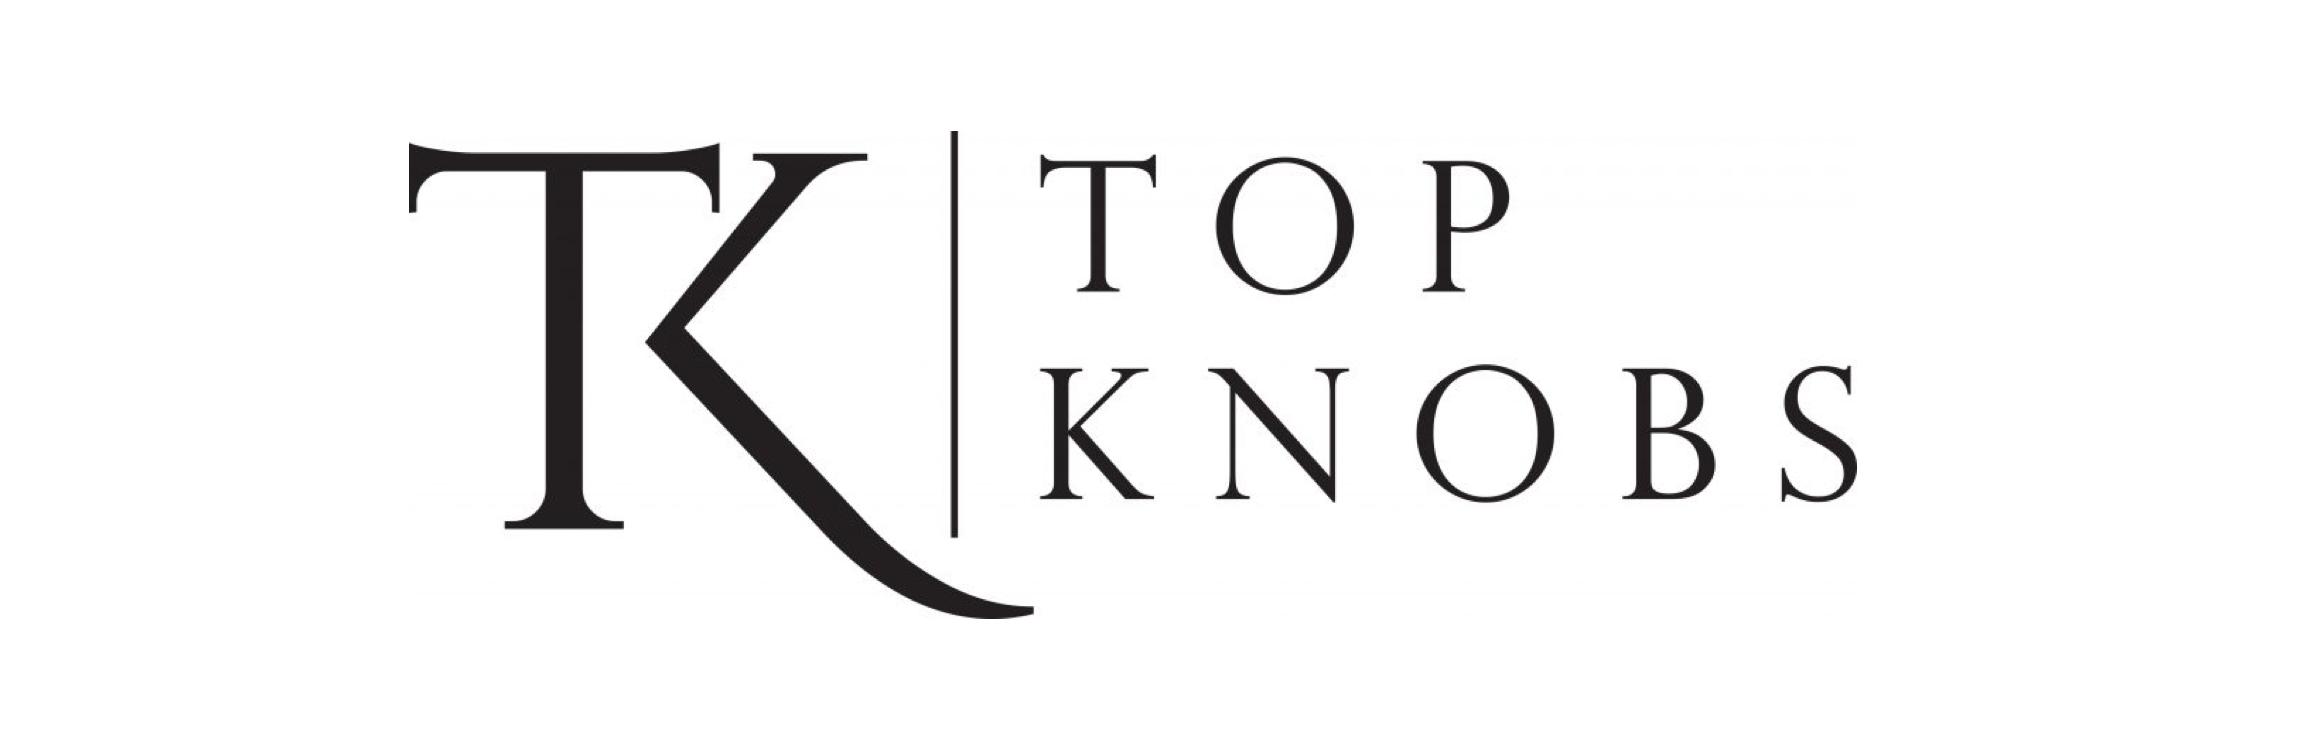 top knobs.png